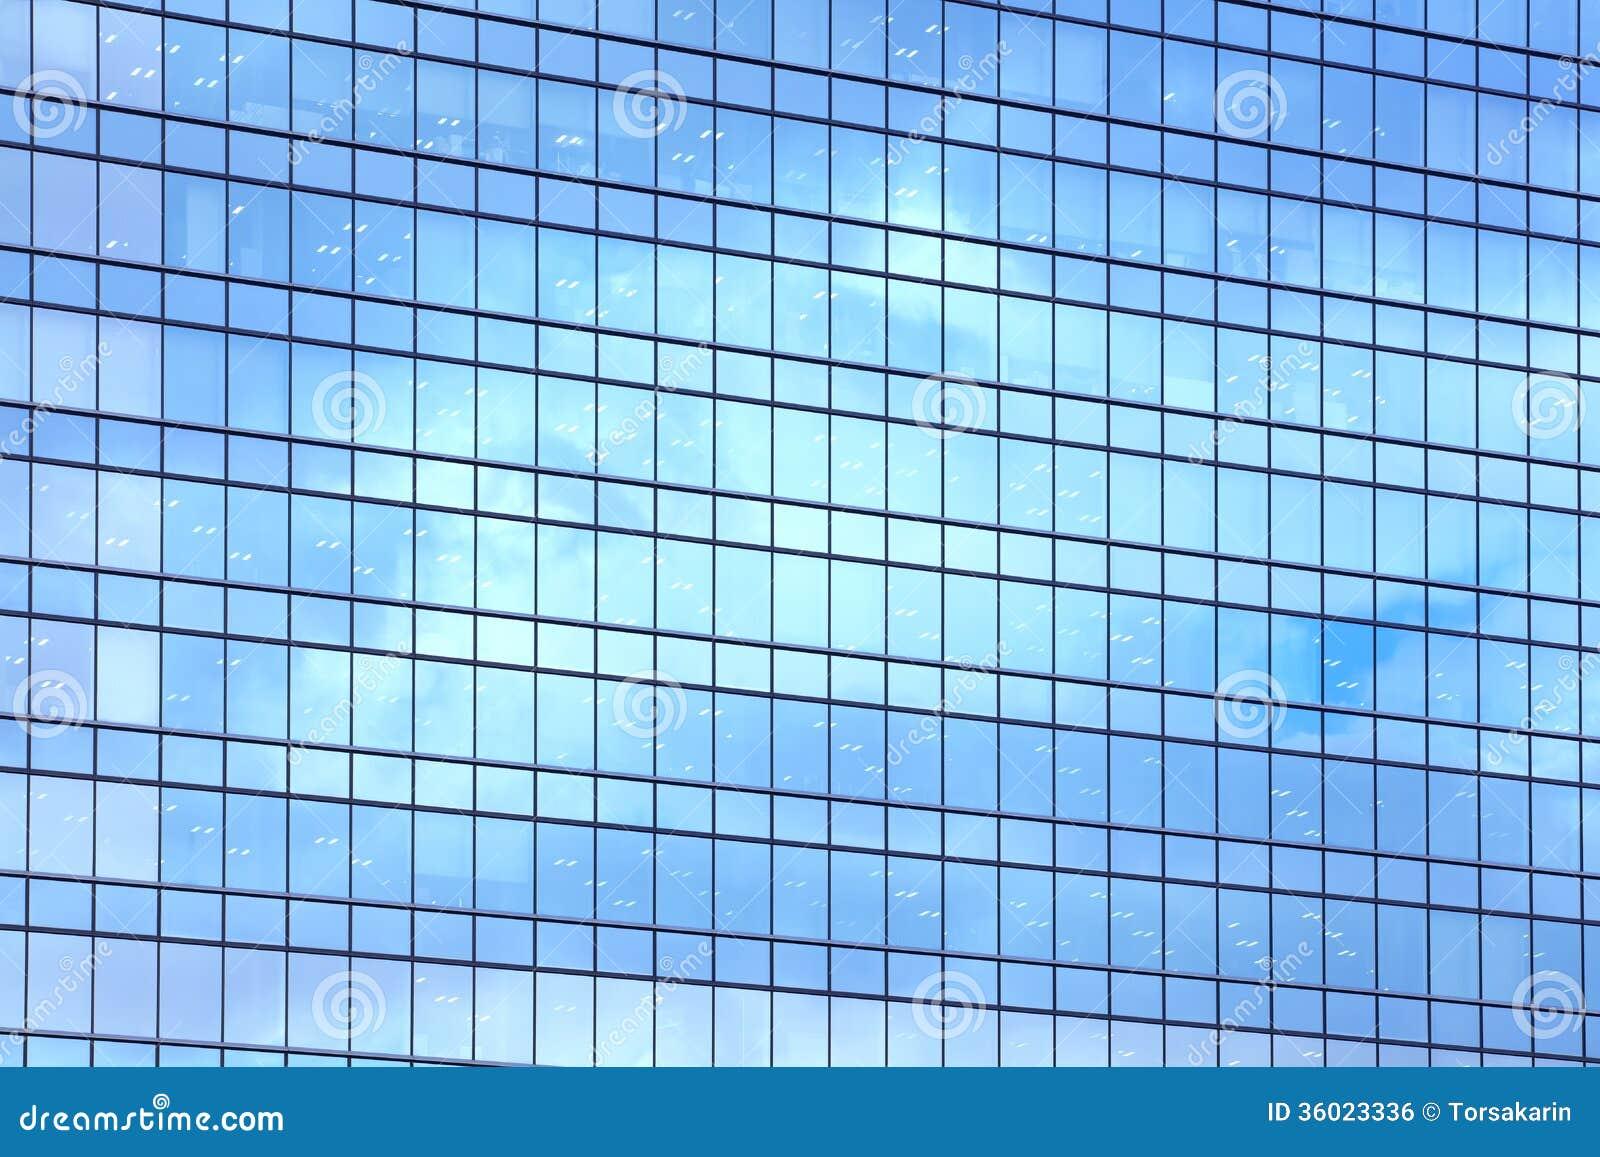 Glasfassade textur  Glasfassade Lizenzfreies Stockbild - Bild: 36023336